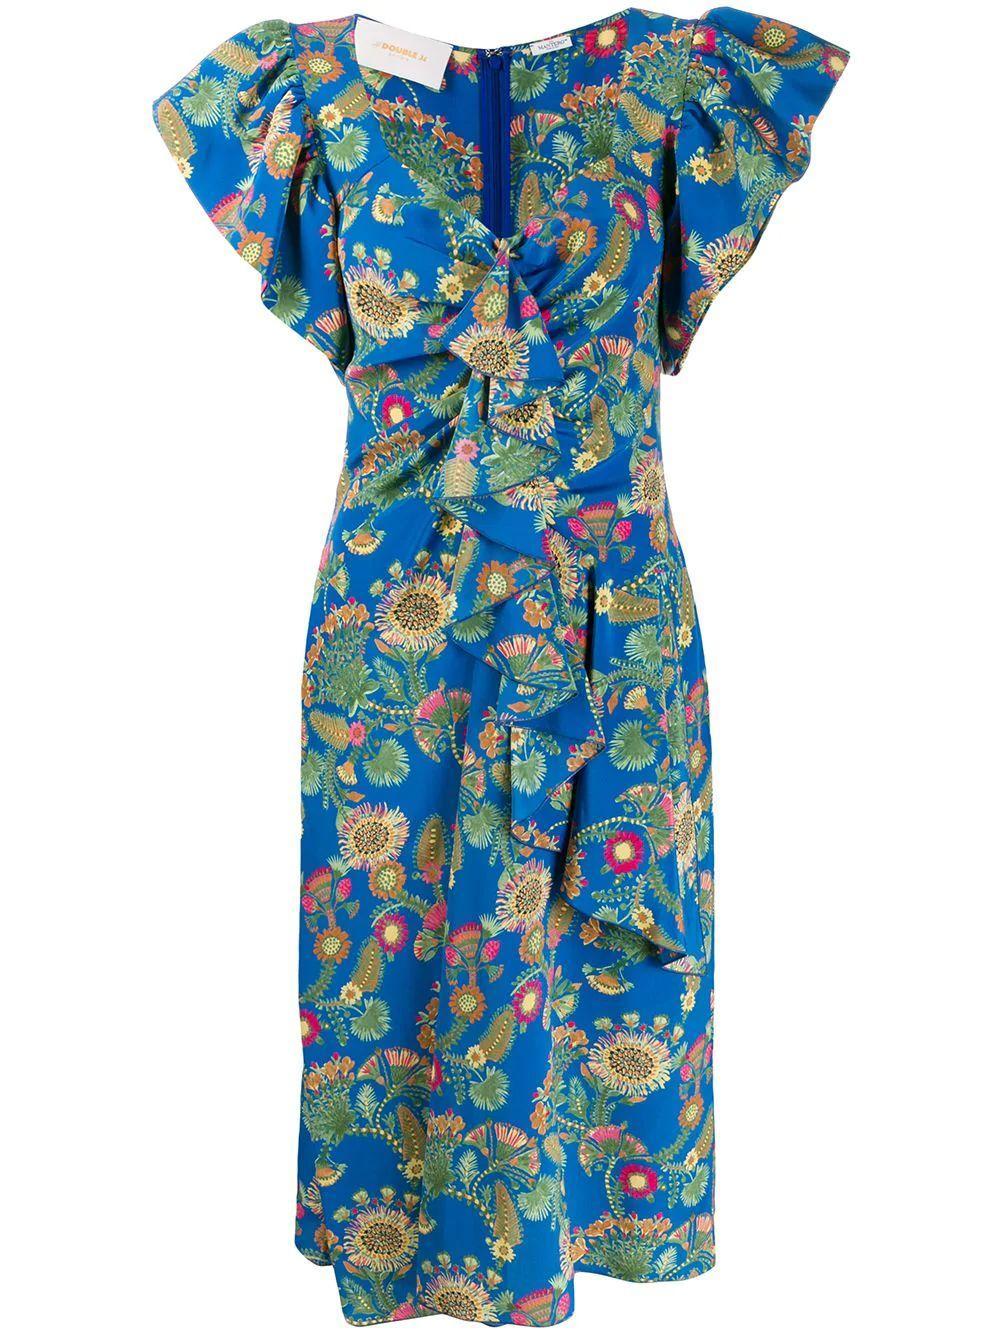 Date Night Ruffle Shoulder Printed Dress Item # DRE0112-CRE001